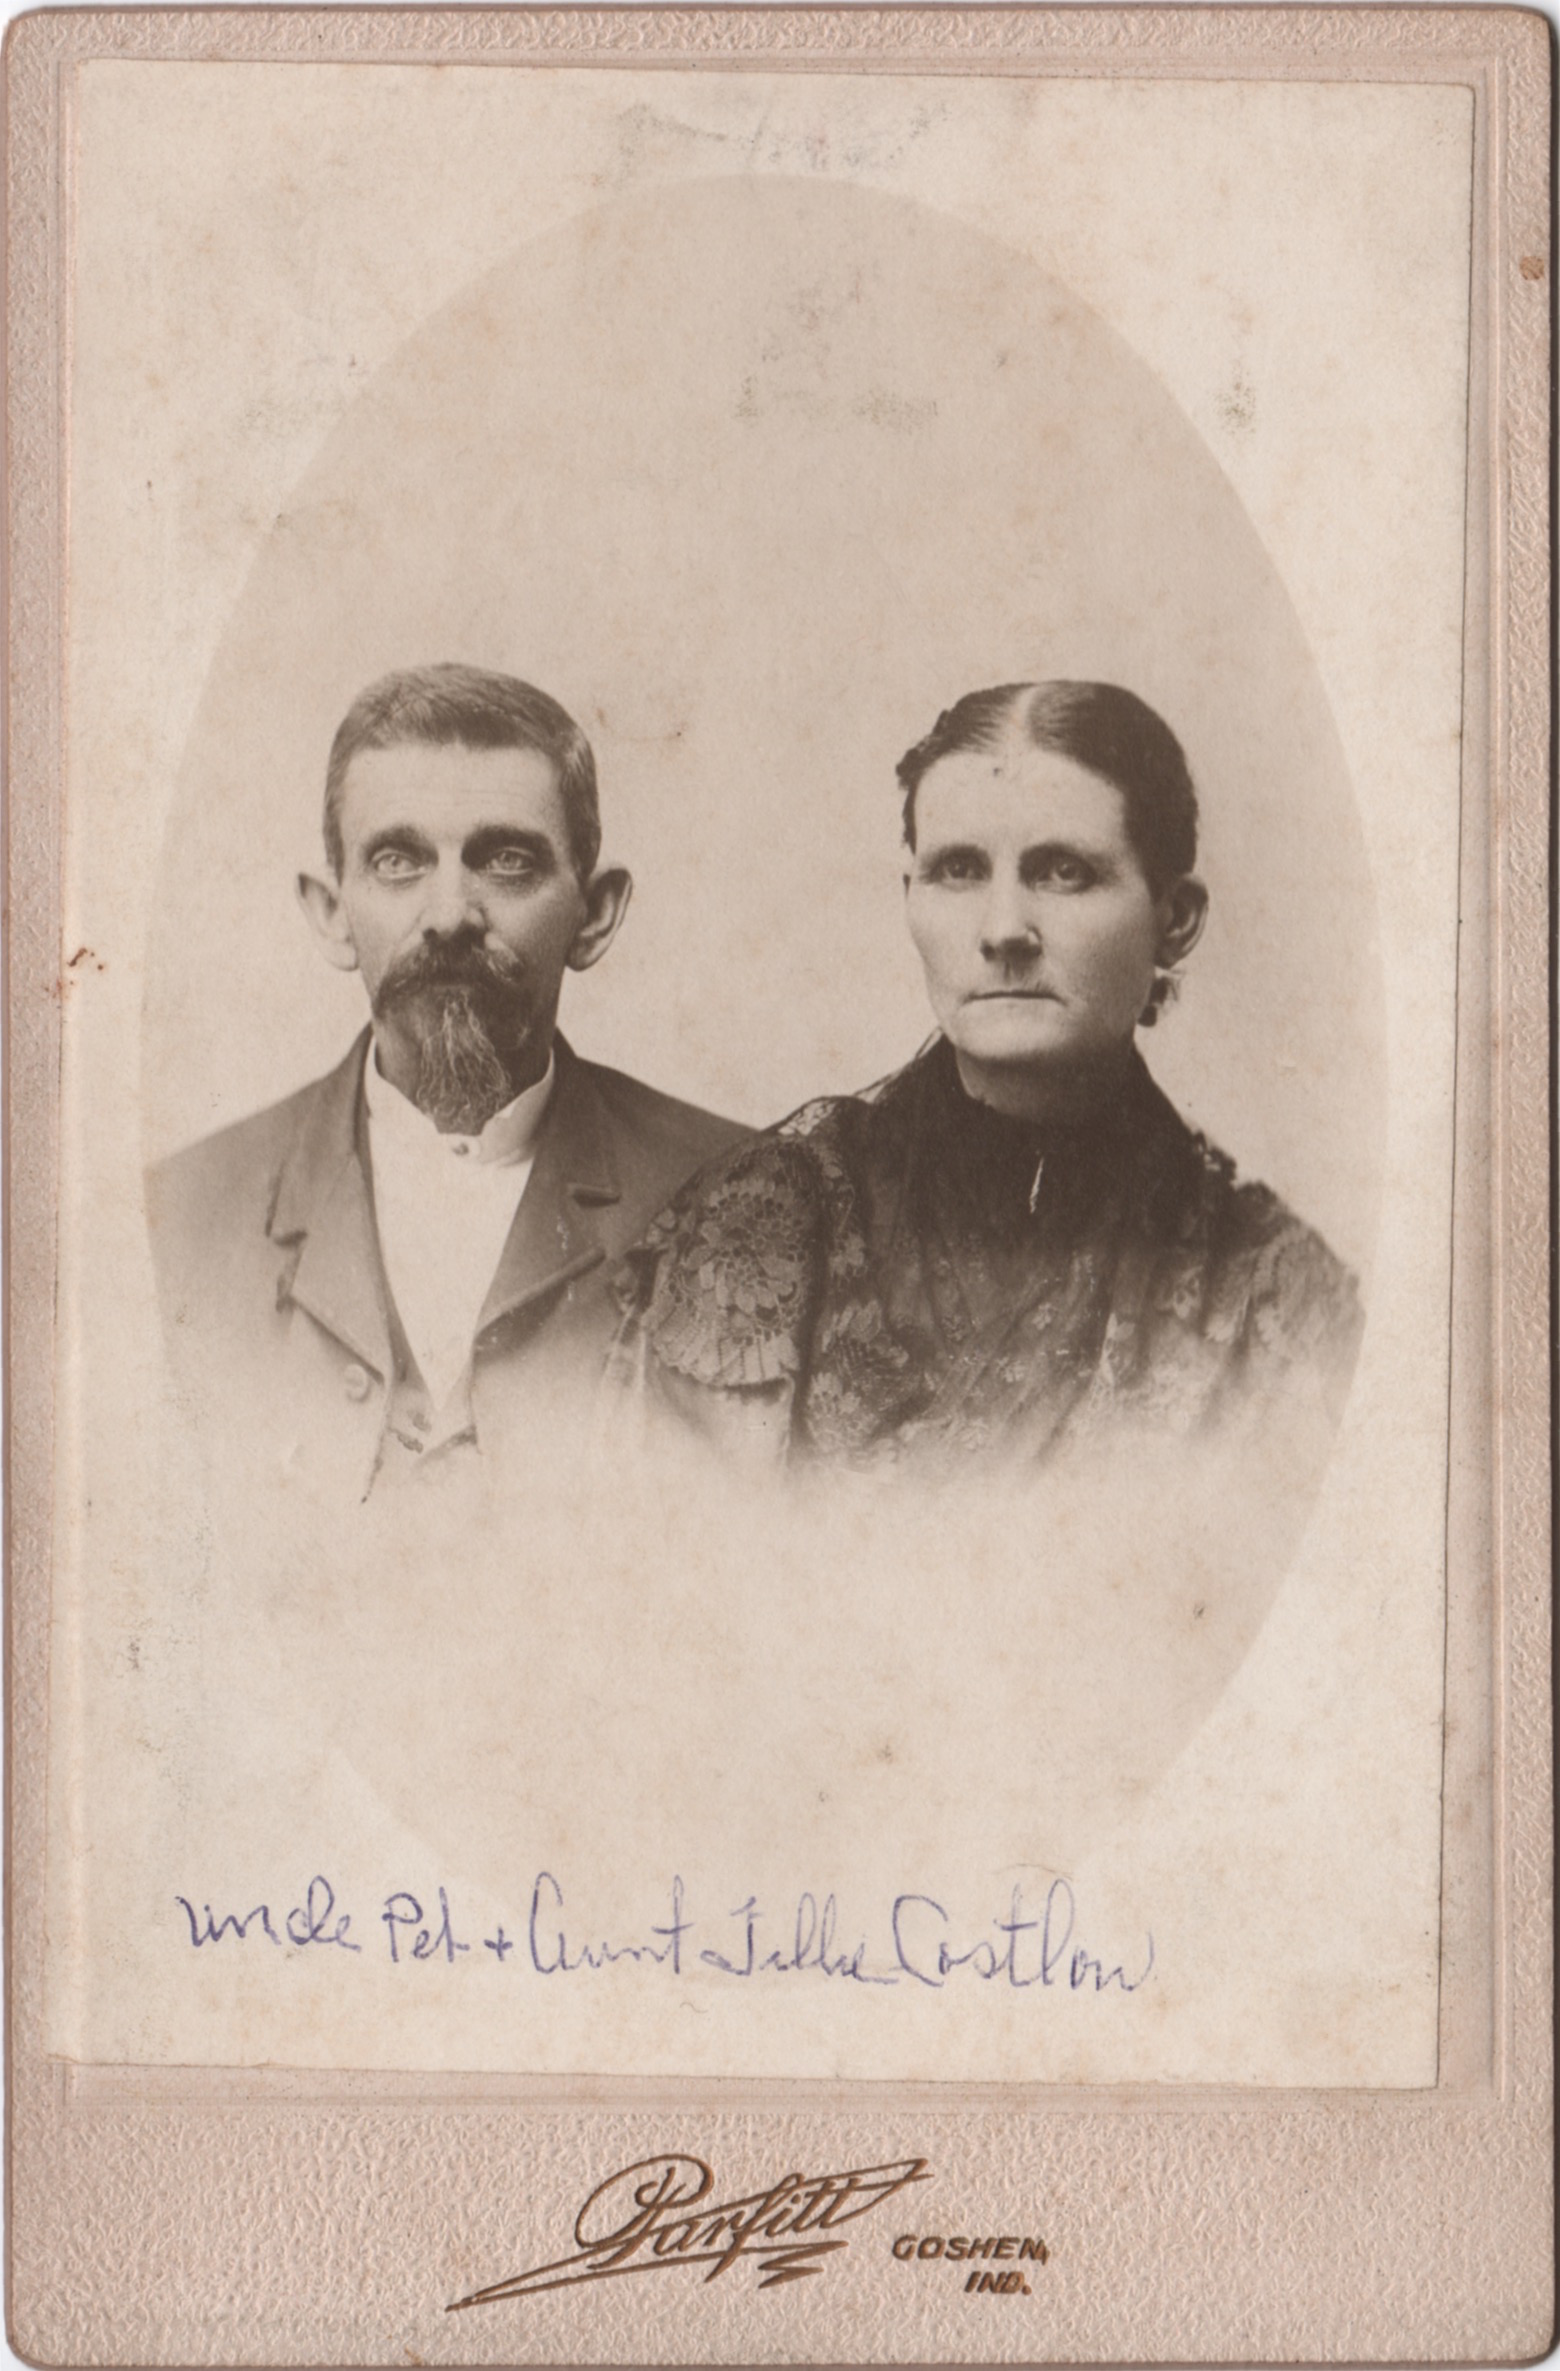 Peter Costlow (1846-1905) and Matilda Topper Costlow (1850-1935)